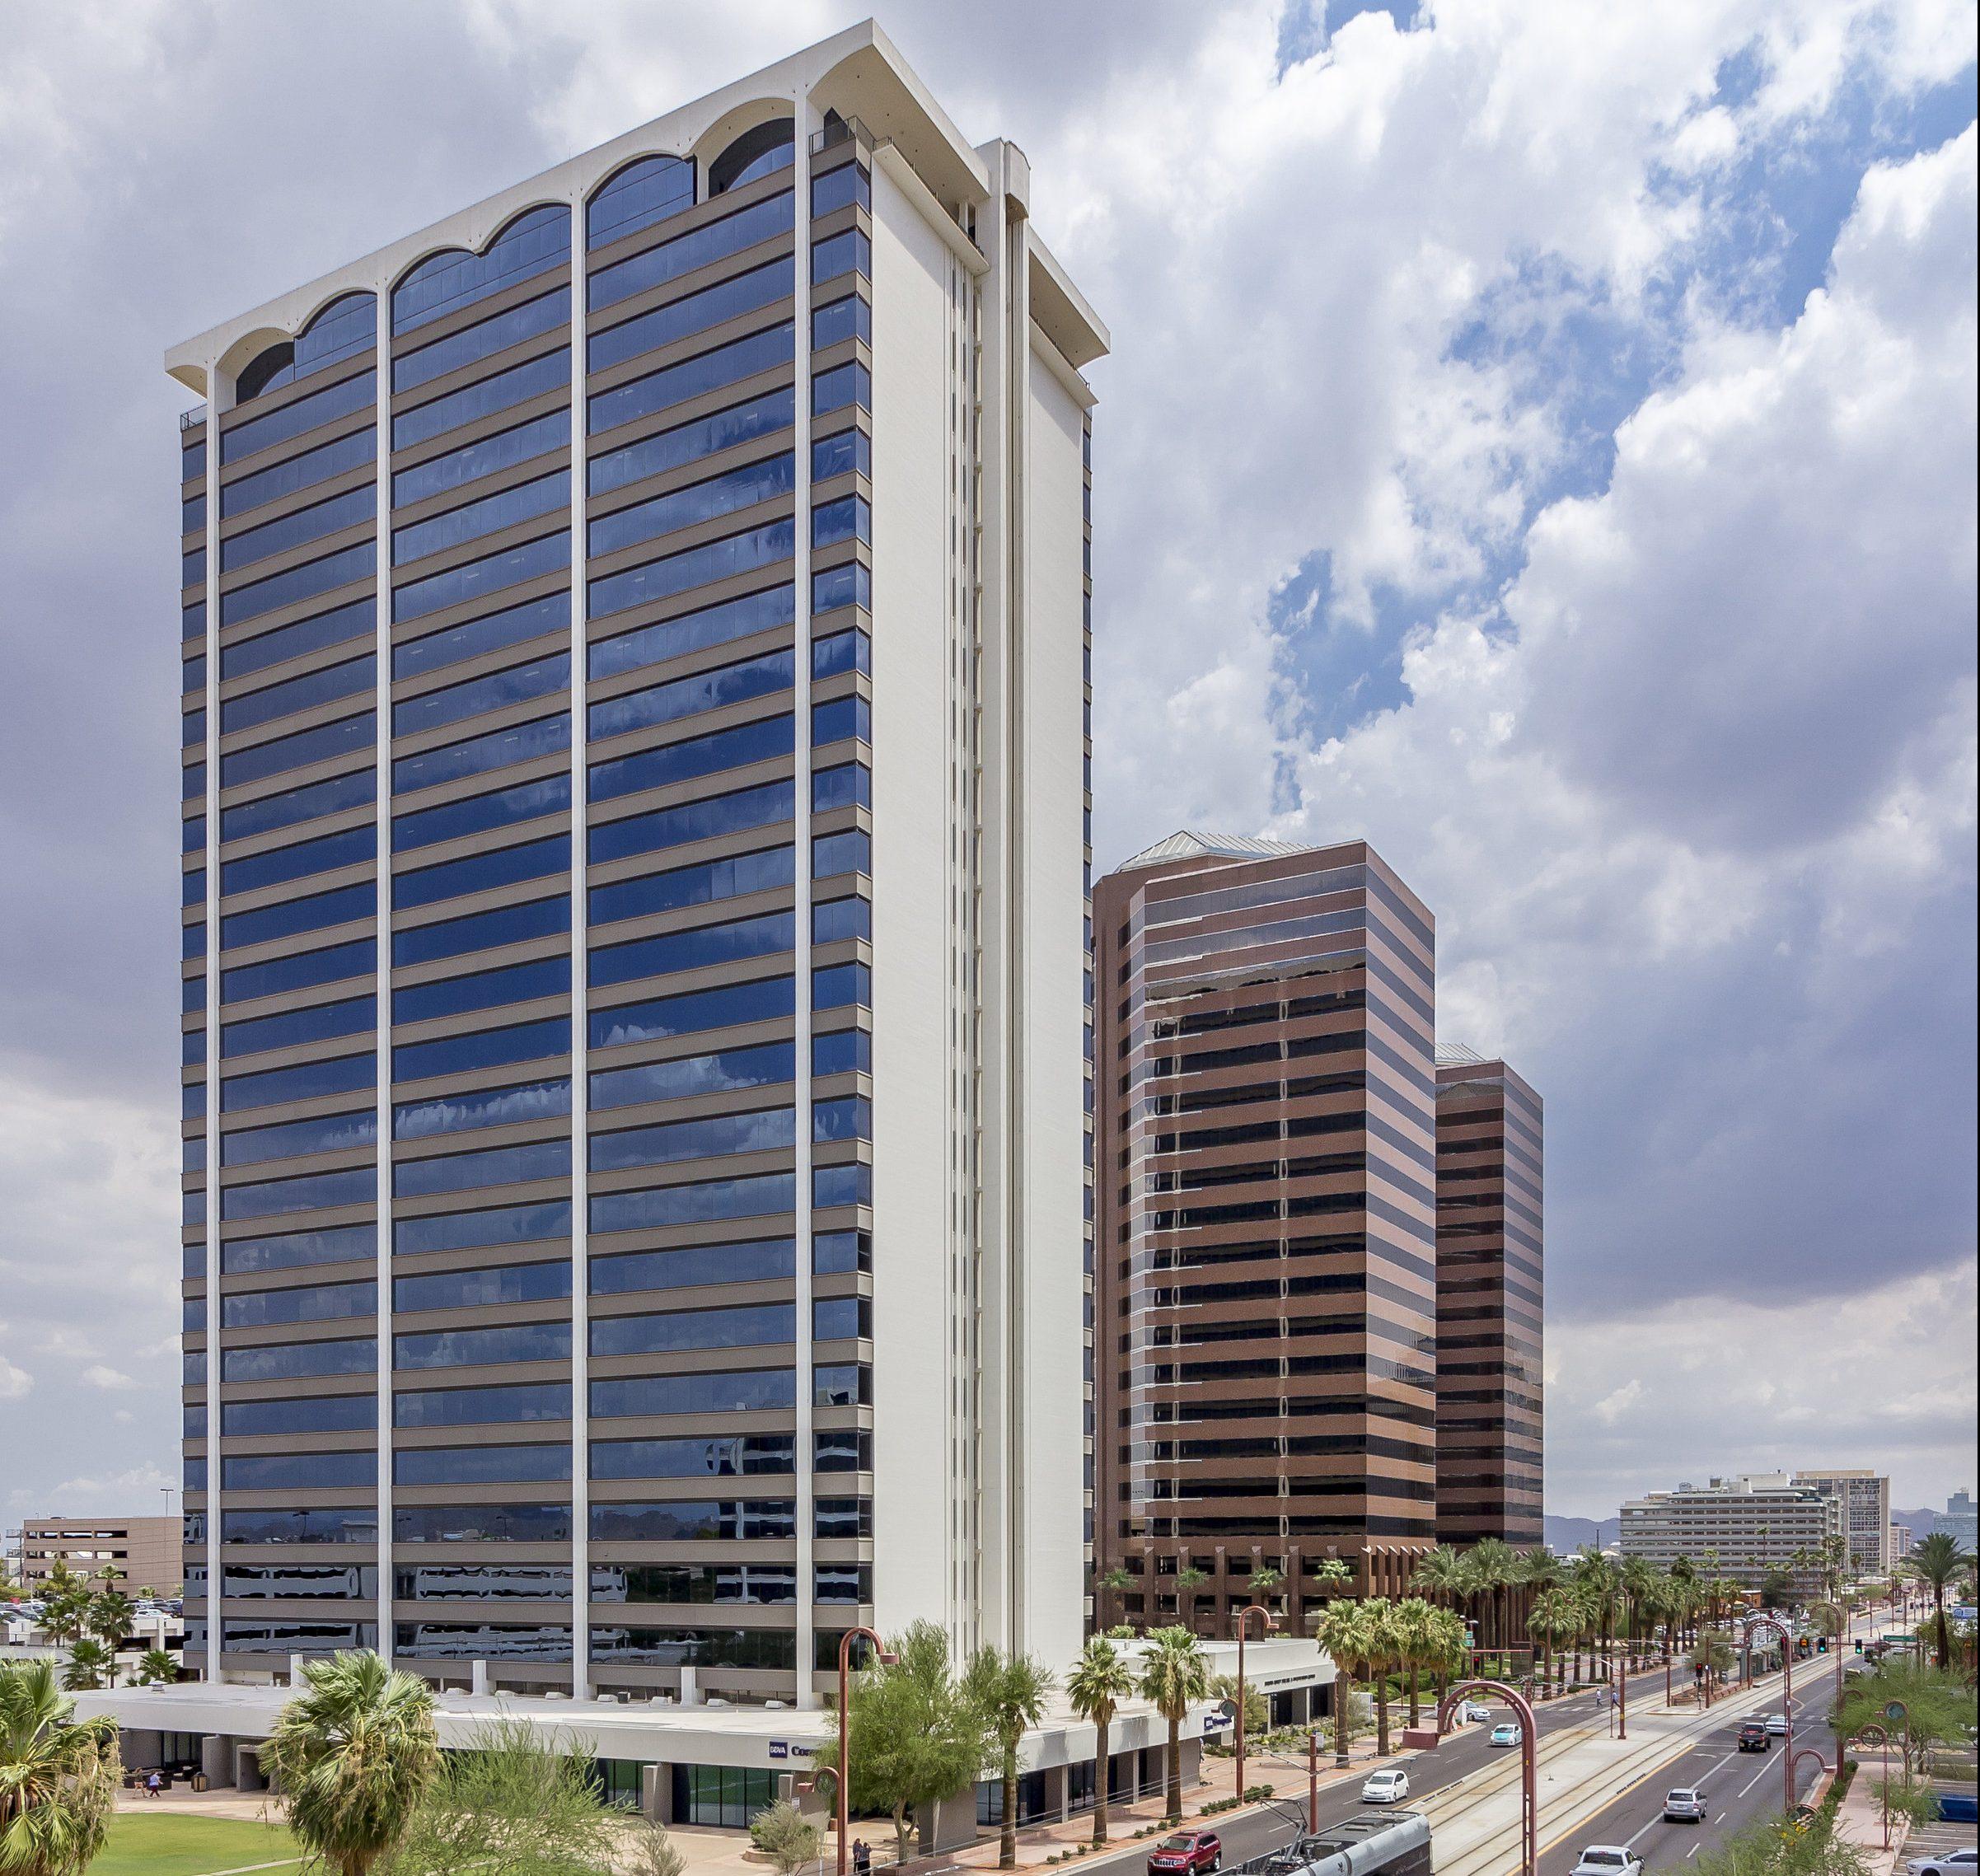 Phoenix Corporate Tower. Photo courtesy of Cushman & Wakefield